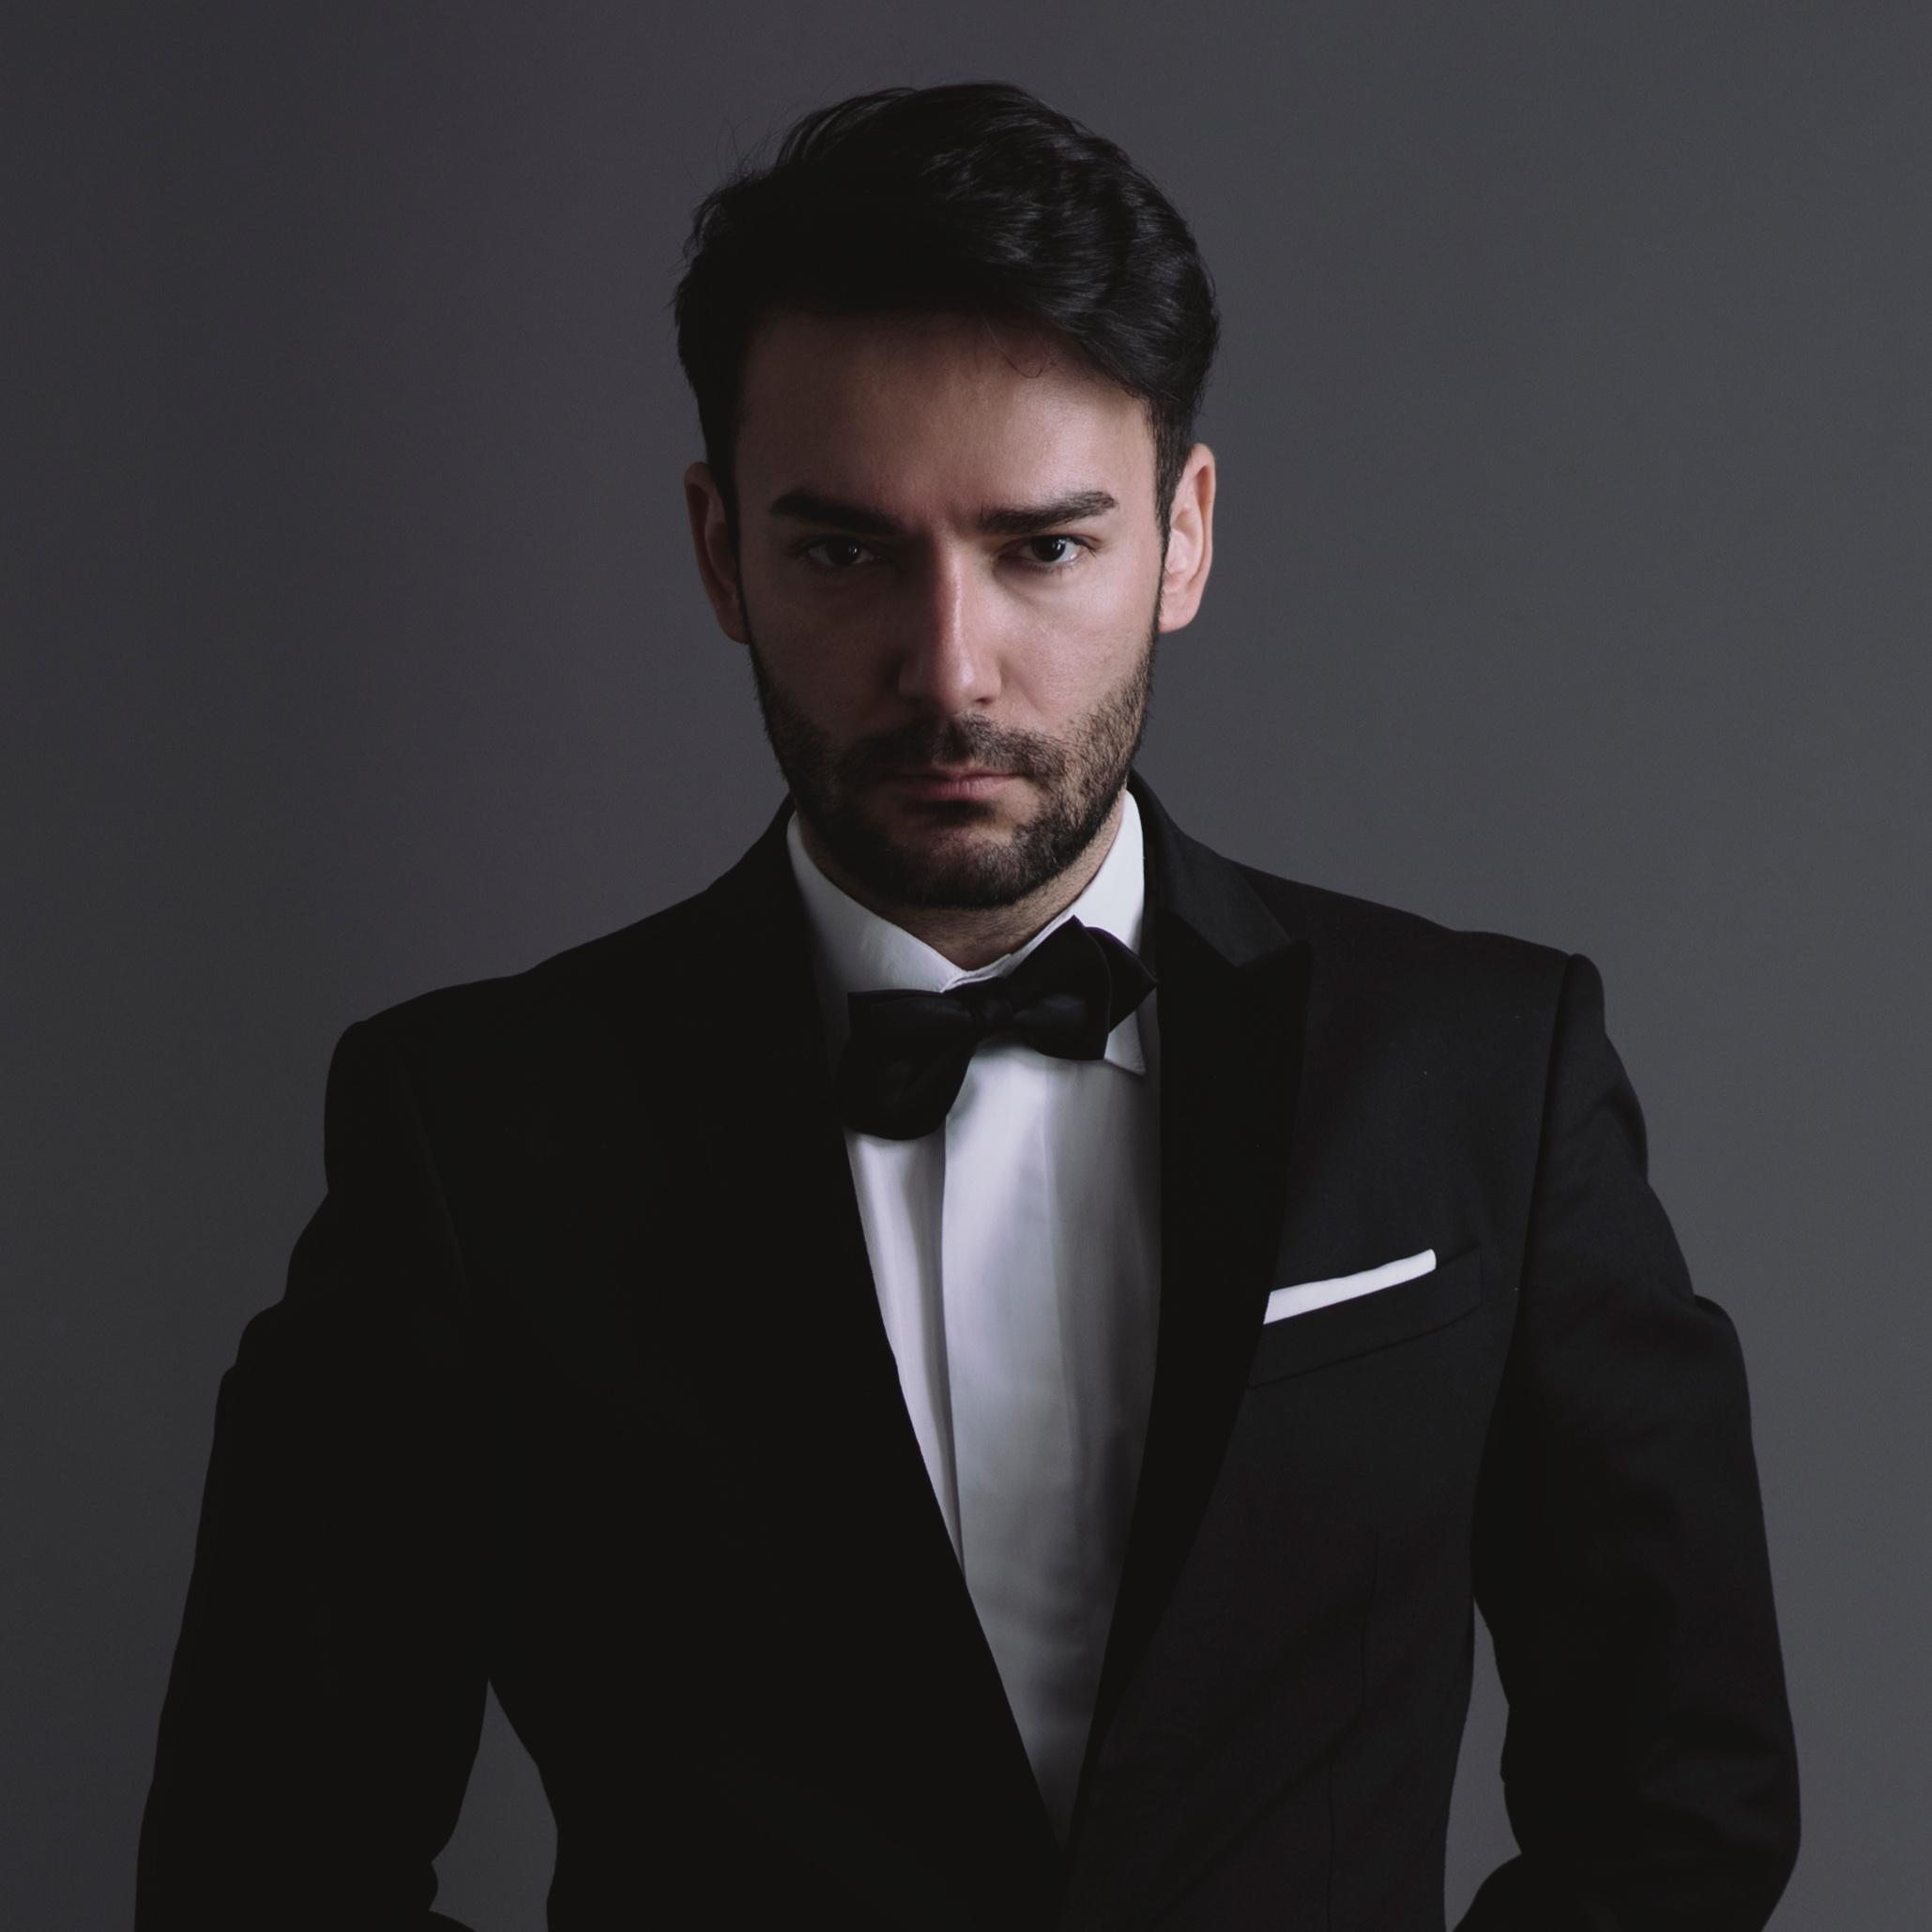 Aleksandar Nikolic - Royal Opera House Covent Garden歌剧导演皇家科文特花园歌剧院 & 贝尔格莱德国家歌剧院